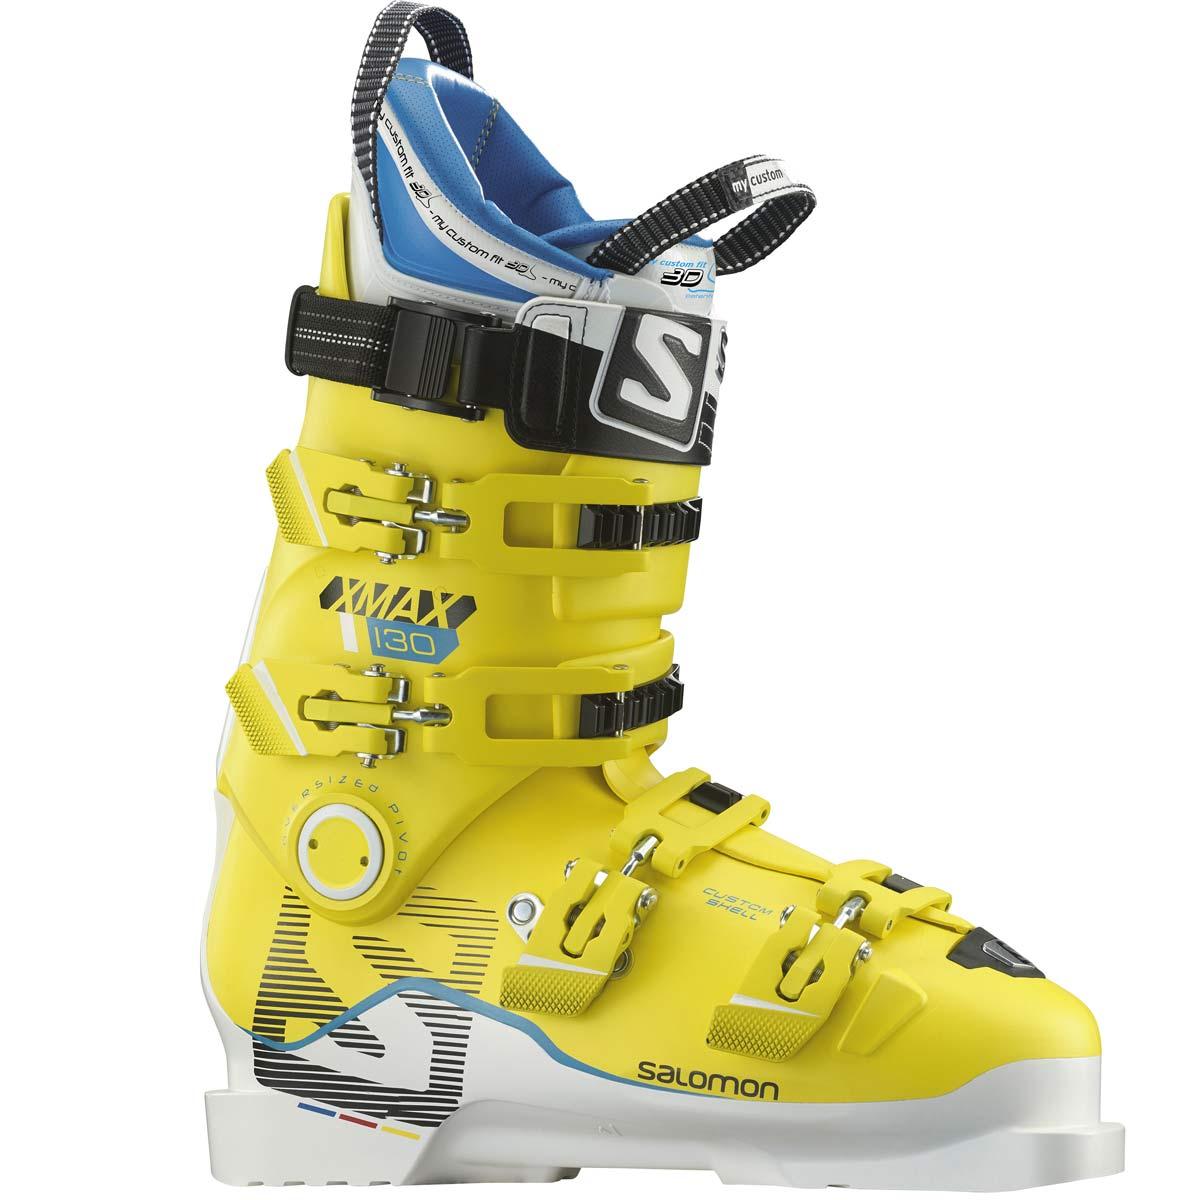 Salomon Men's X Max 130 Ski Boots On Sale